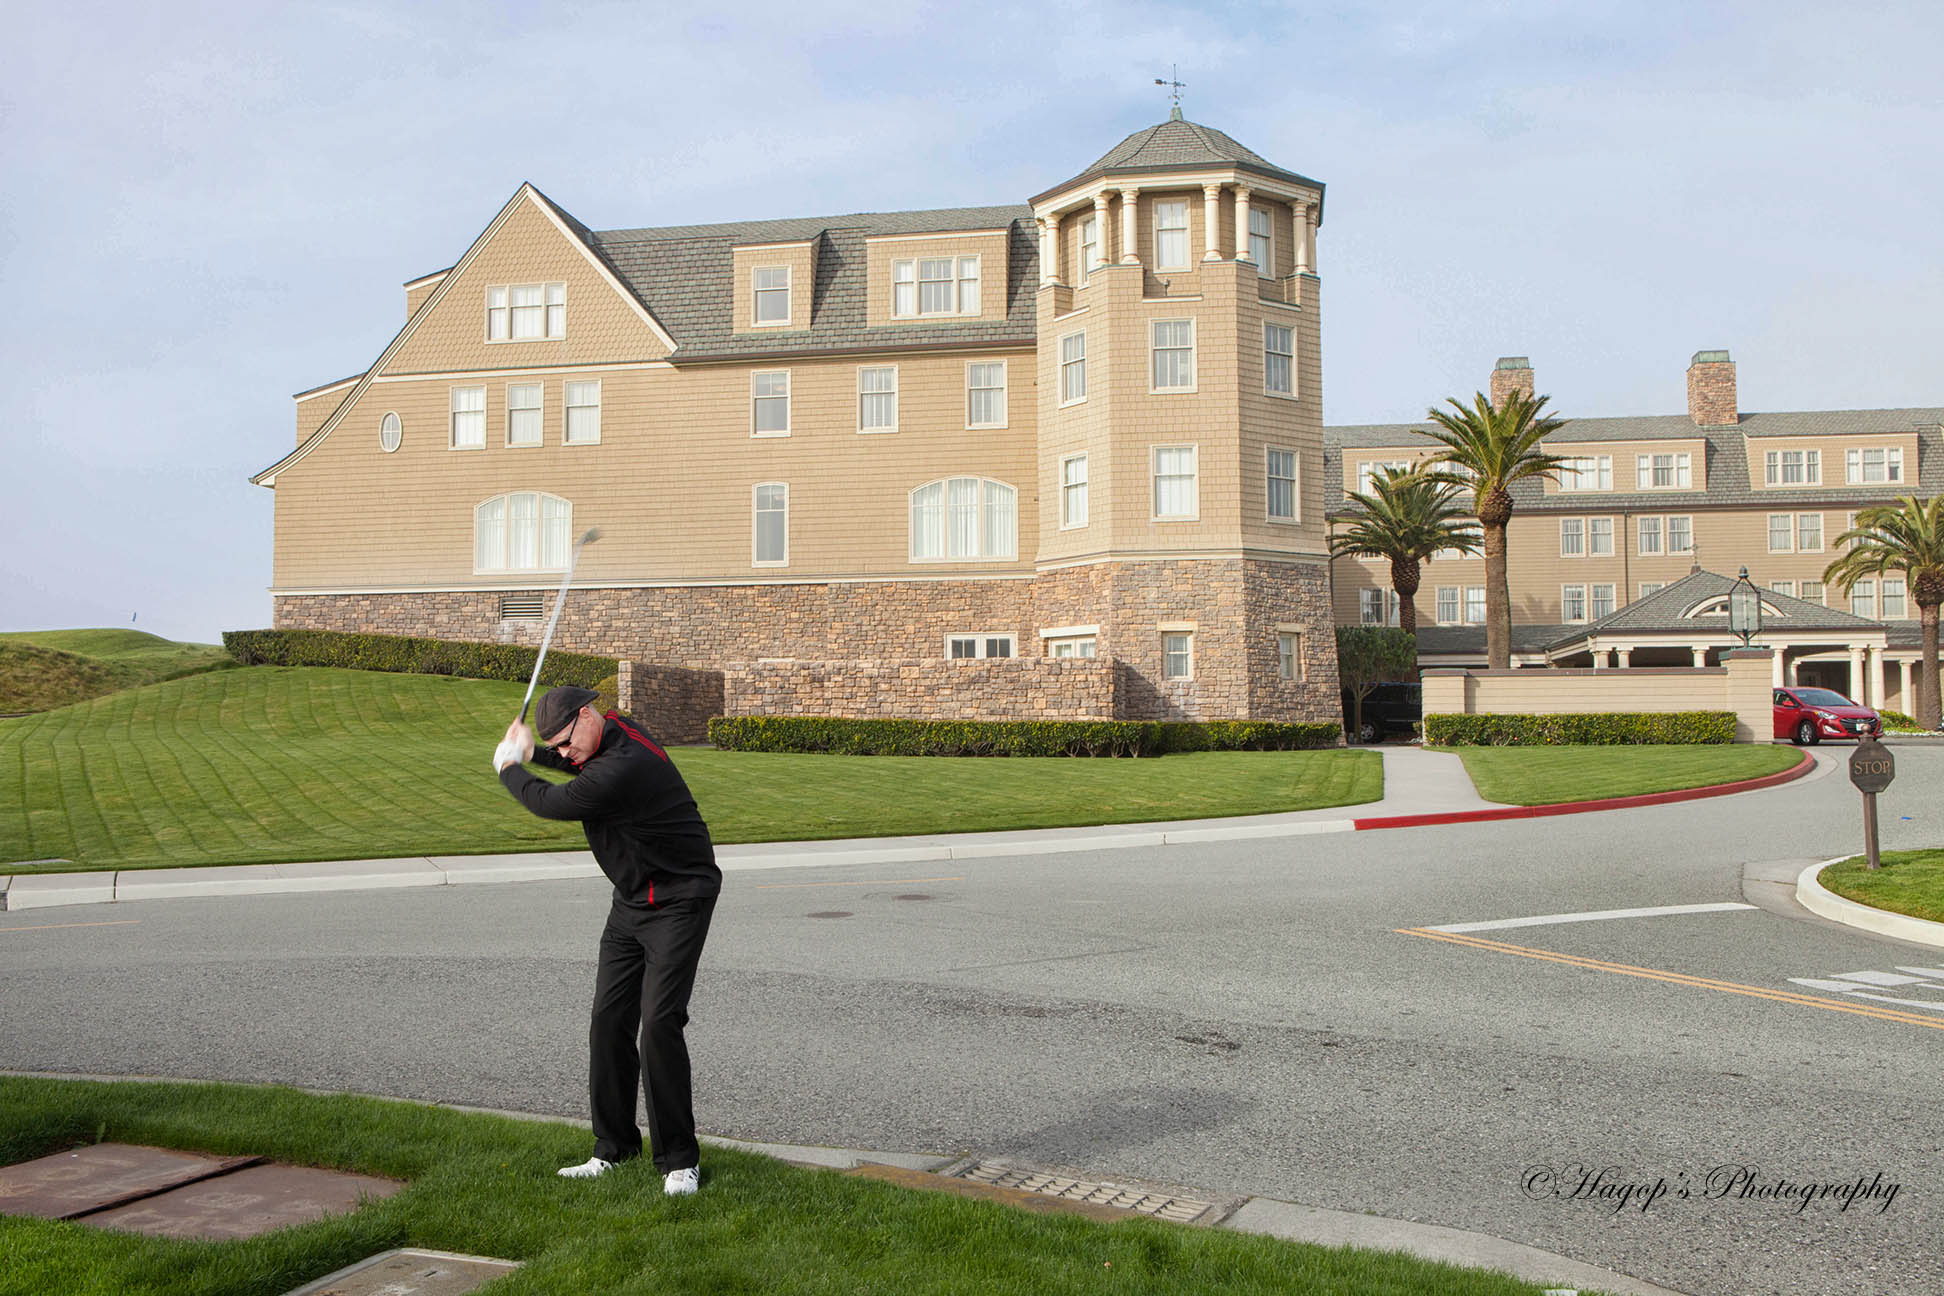 golfer in front of the ritz carlton hotel in hmb